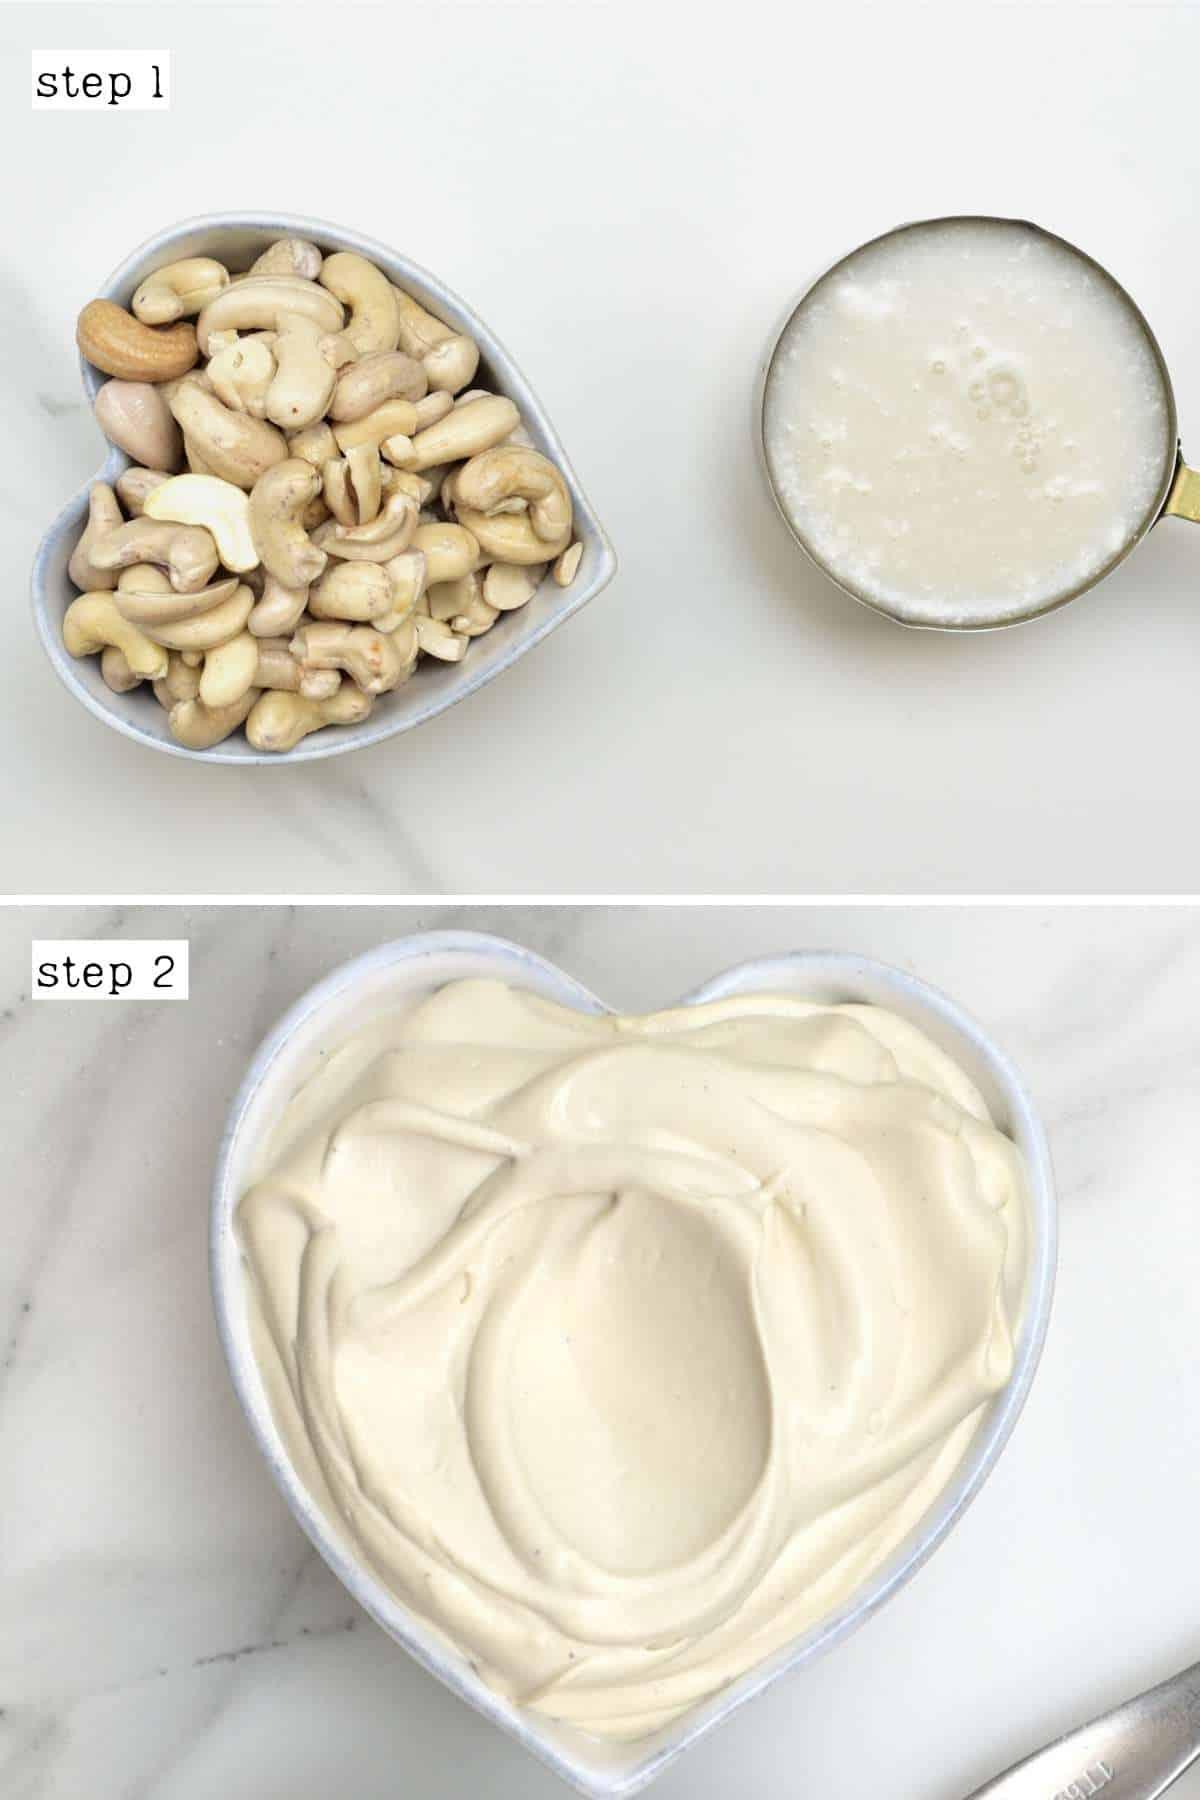 Steps for making cashew cream